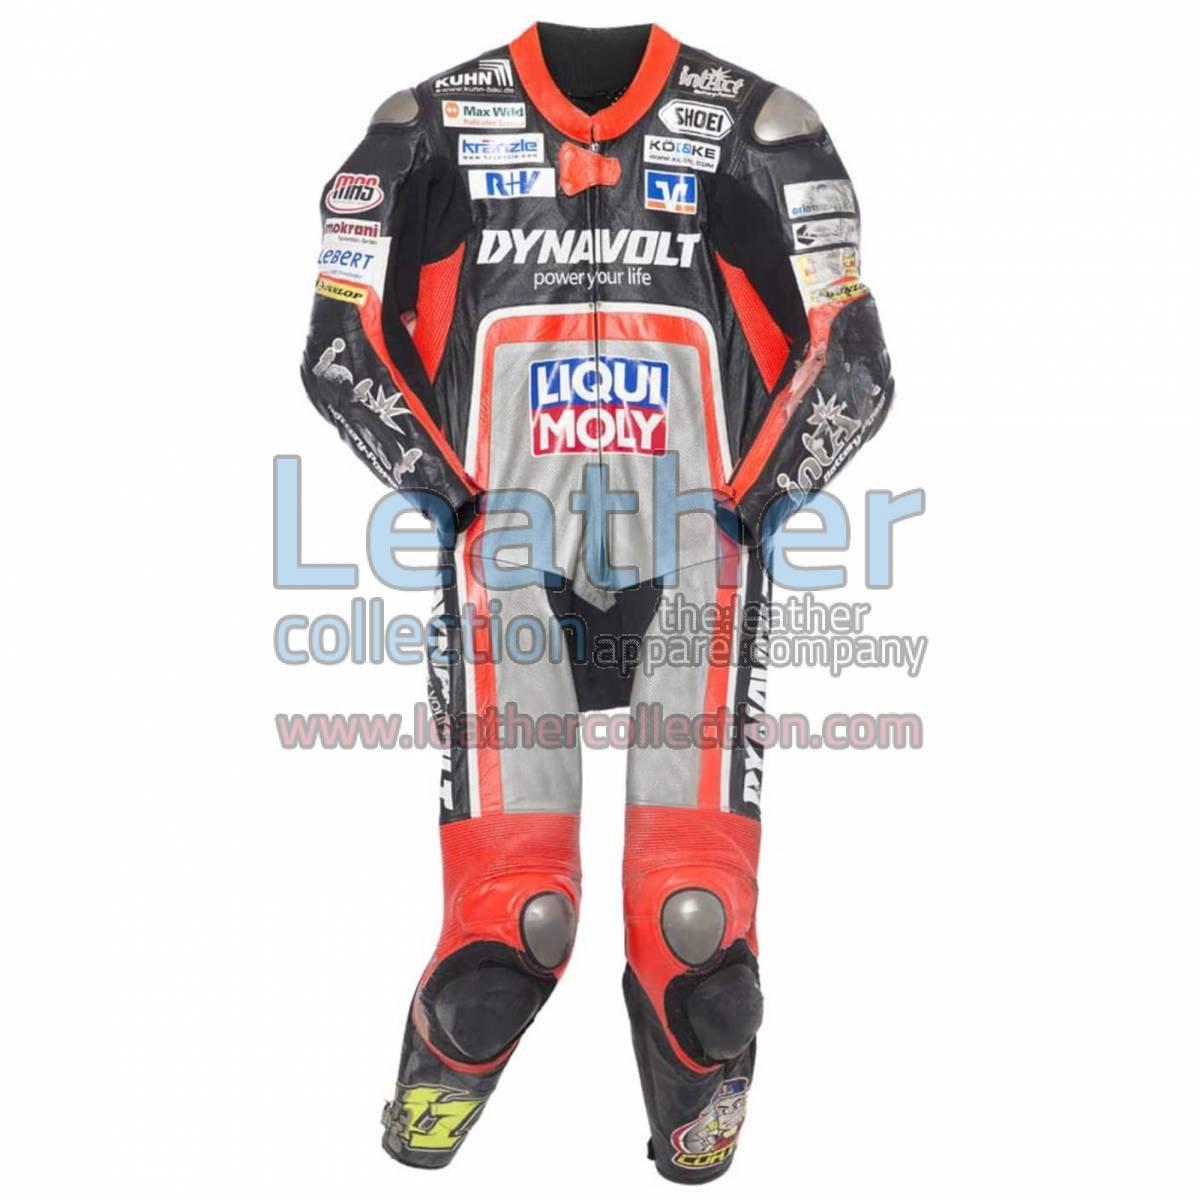 Sandro Cortese 2014 Moto2 Motorbike Leather Suit